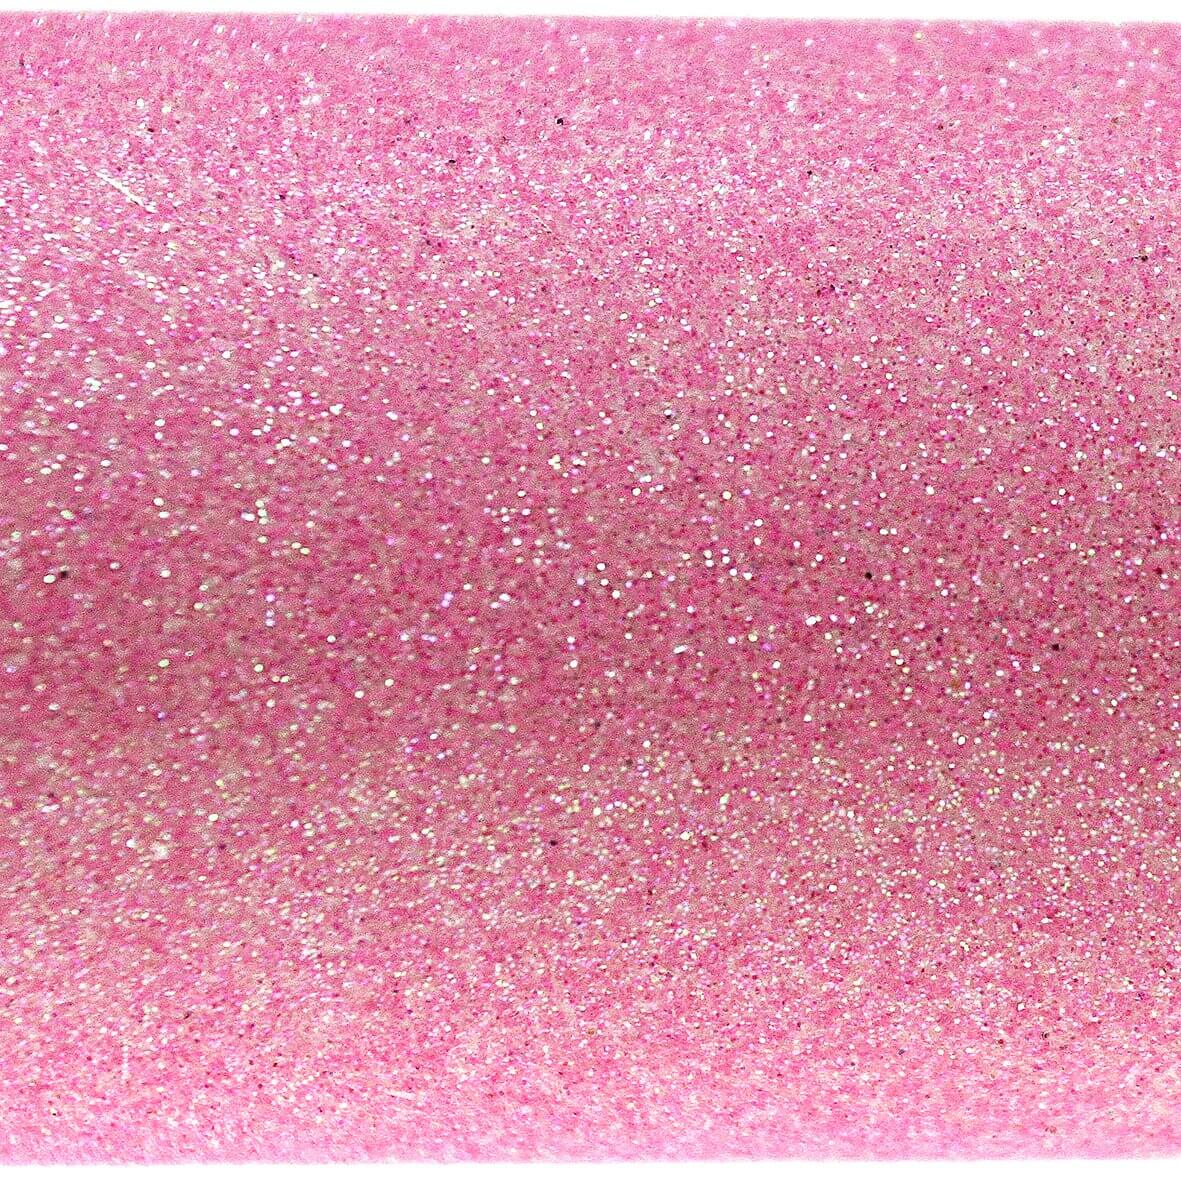 Iridescent Sugar Pink A4 Glitter Paper - Close Up